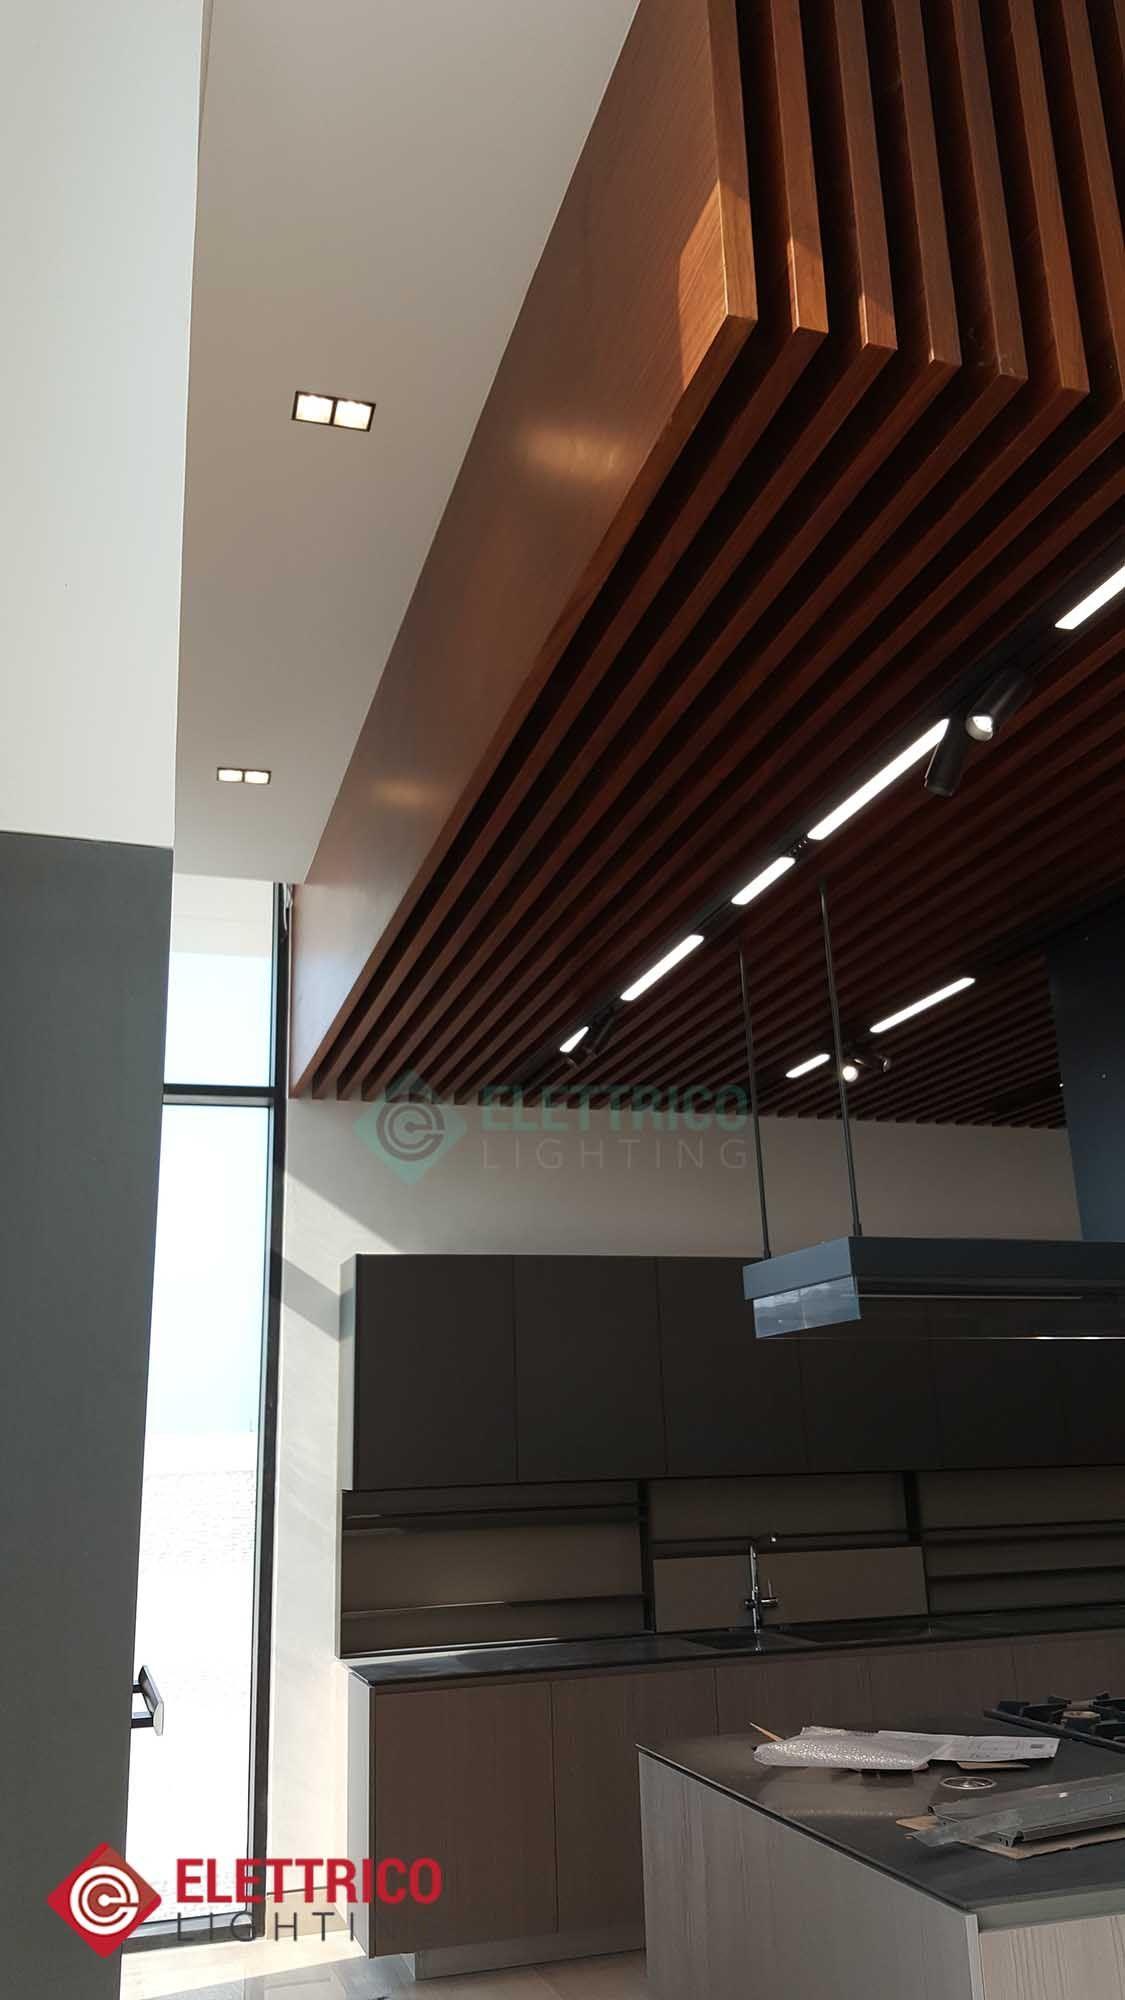 Lighting Track System For Ceiling Elettrico In Dubai Lighting Design Interior Luxury House Interior Design Luxury Homes Interior